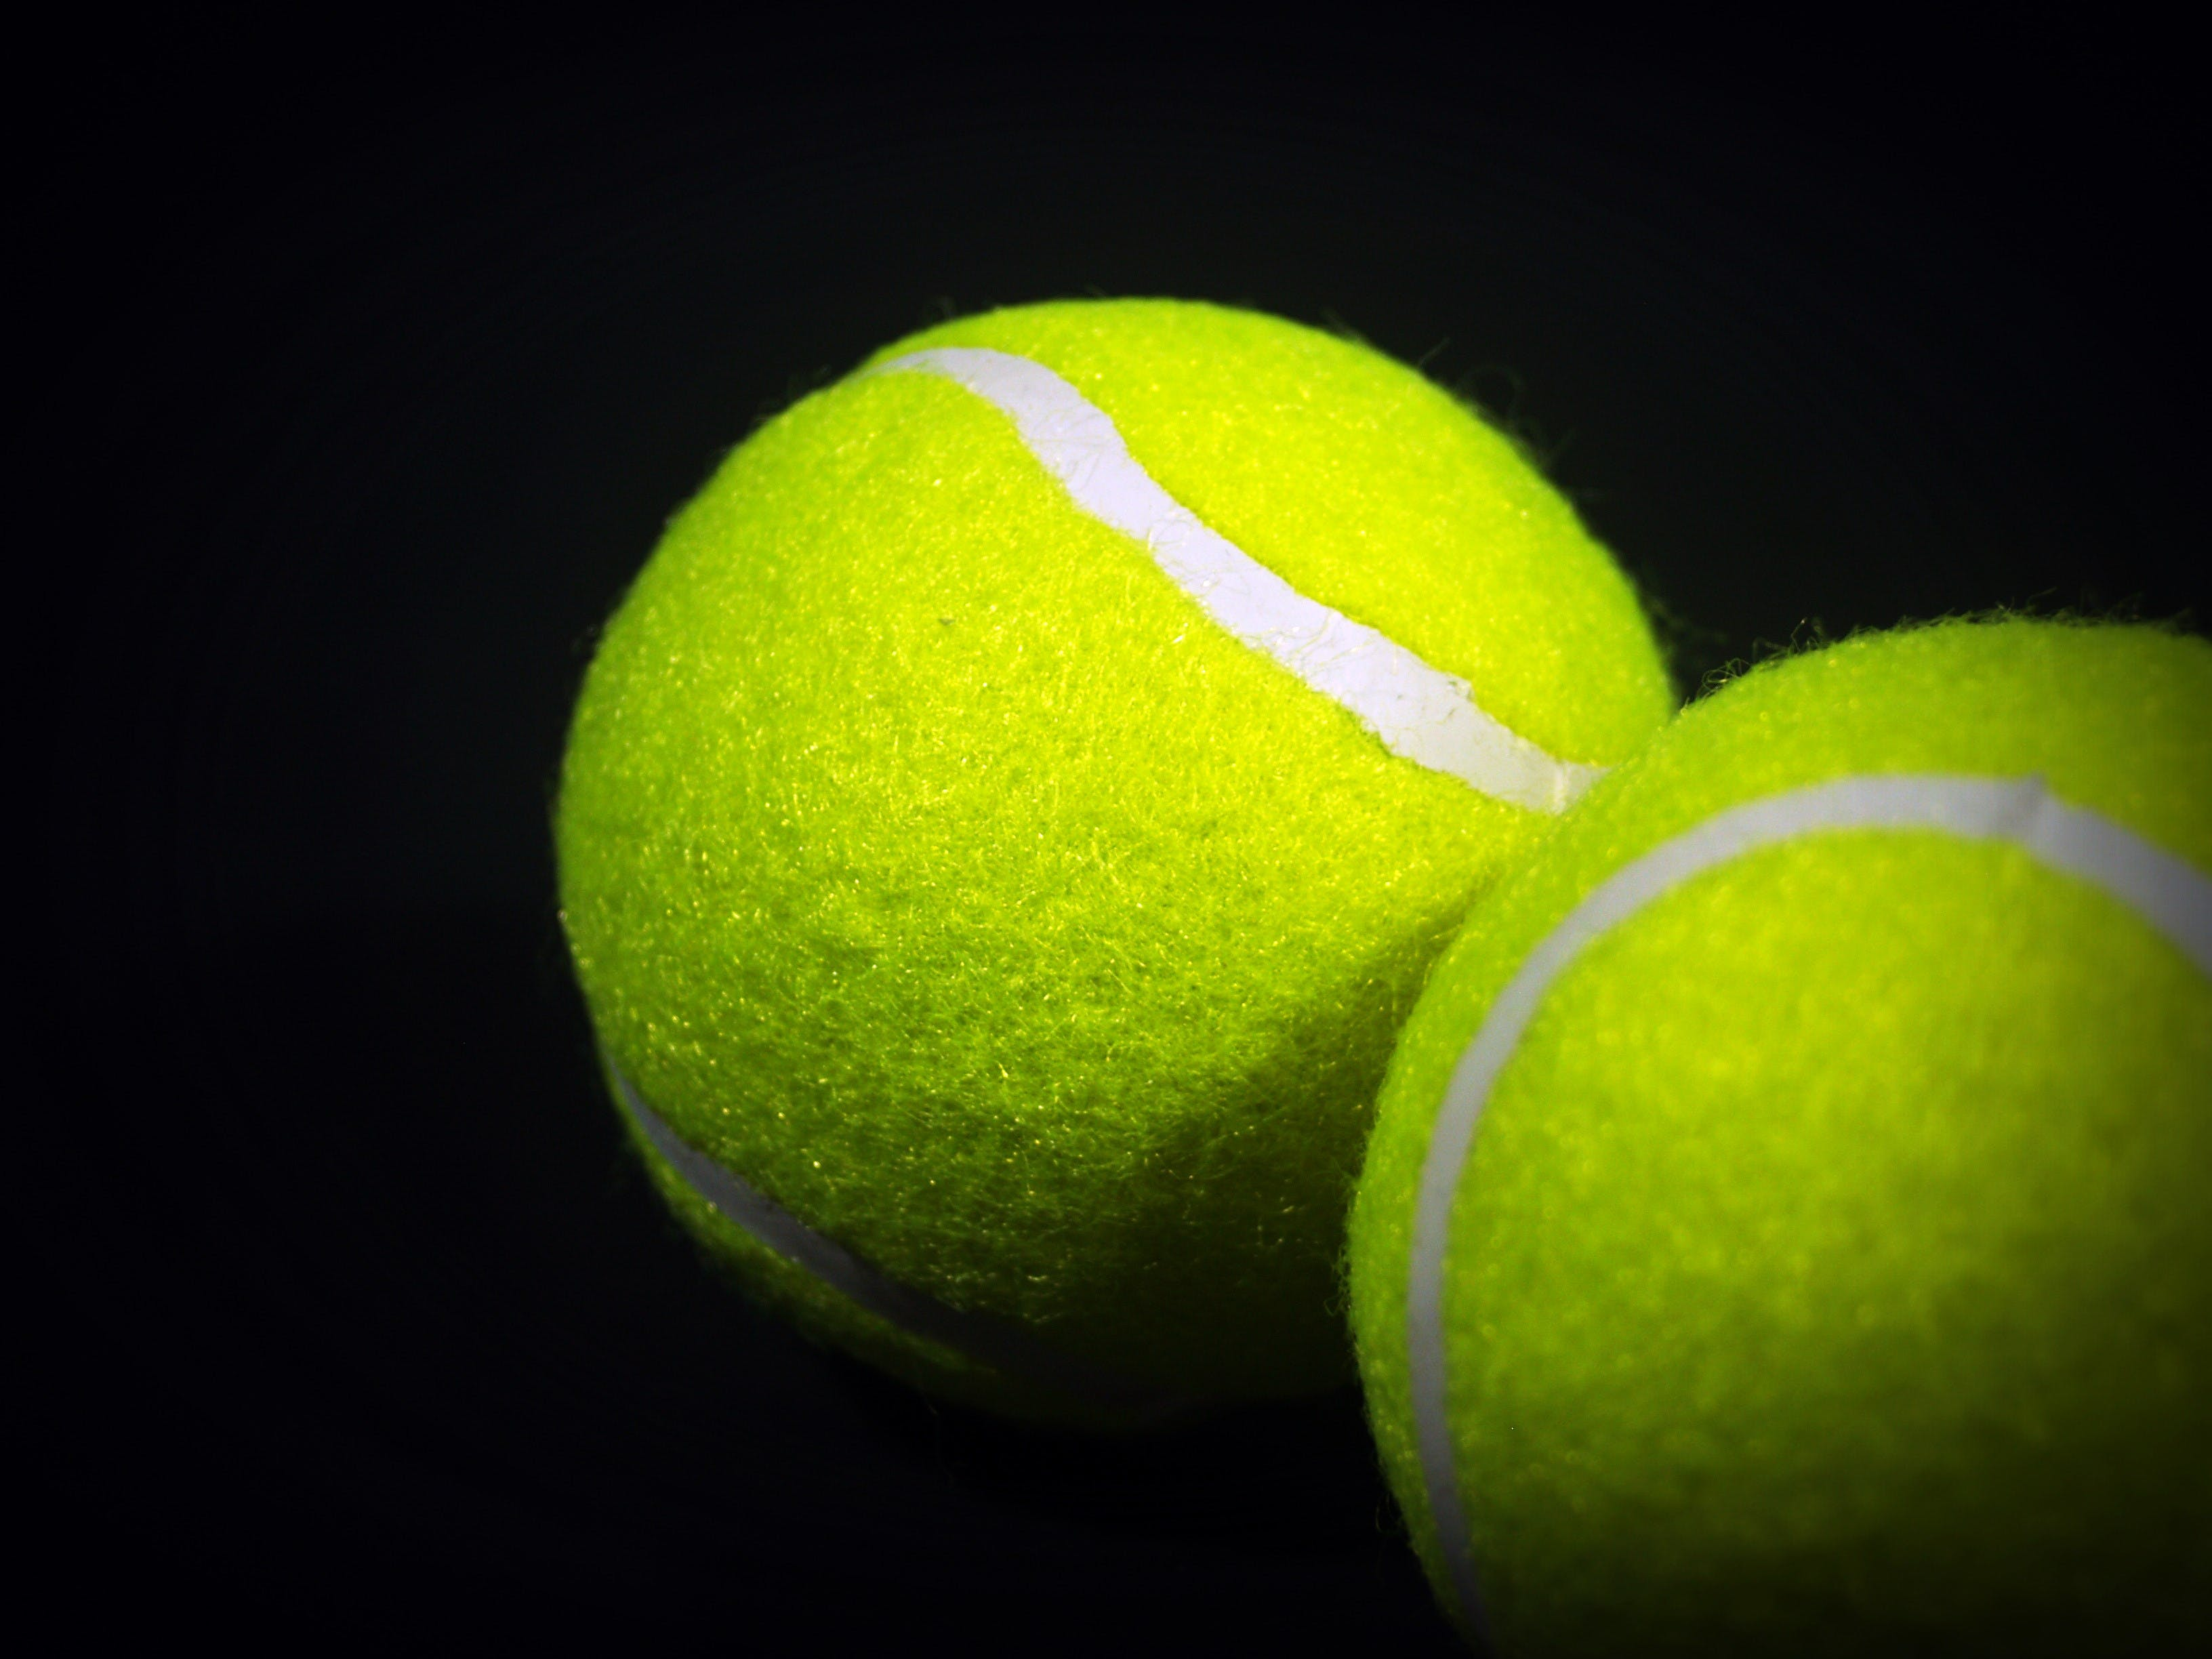 Kostenloses Stock Foto zu bälle, nahansicht, tennis, tennis ball